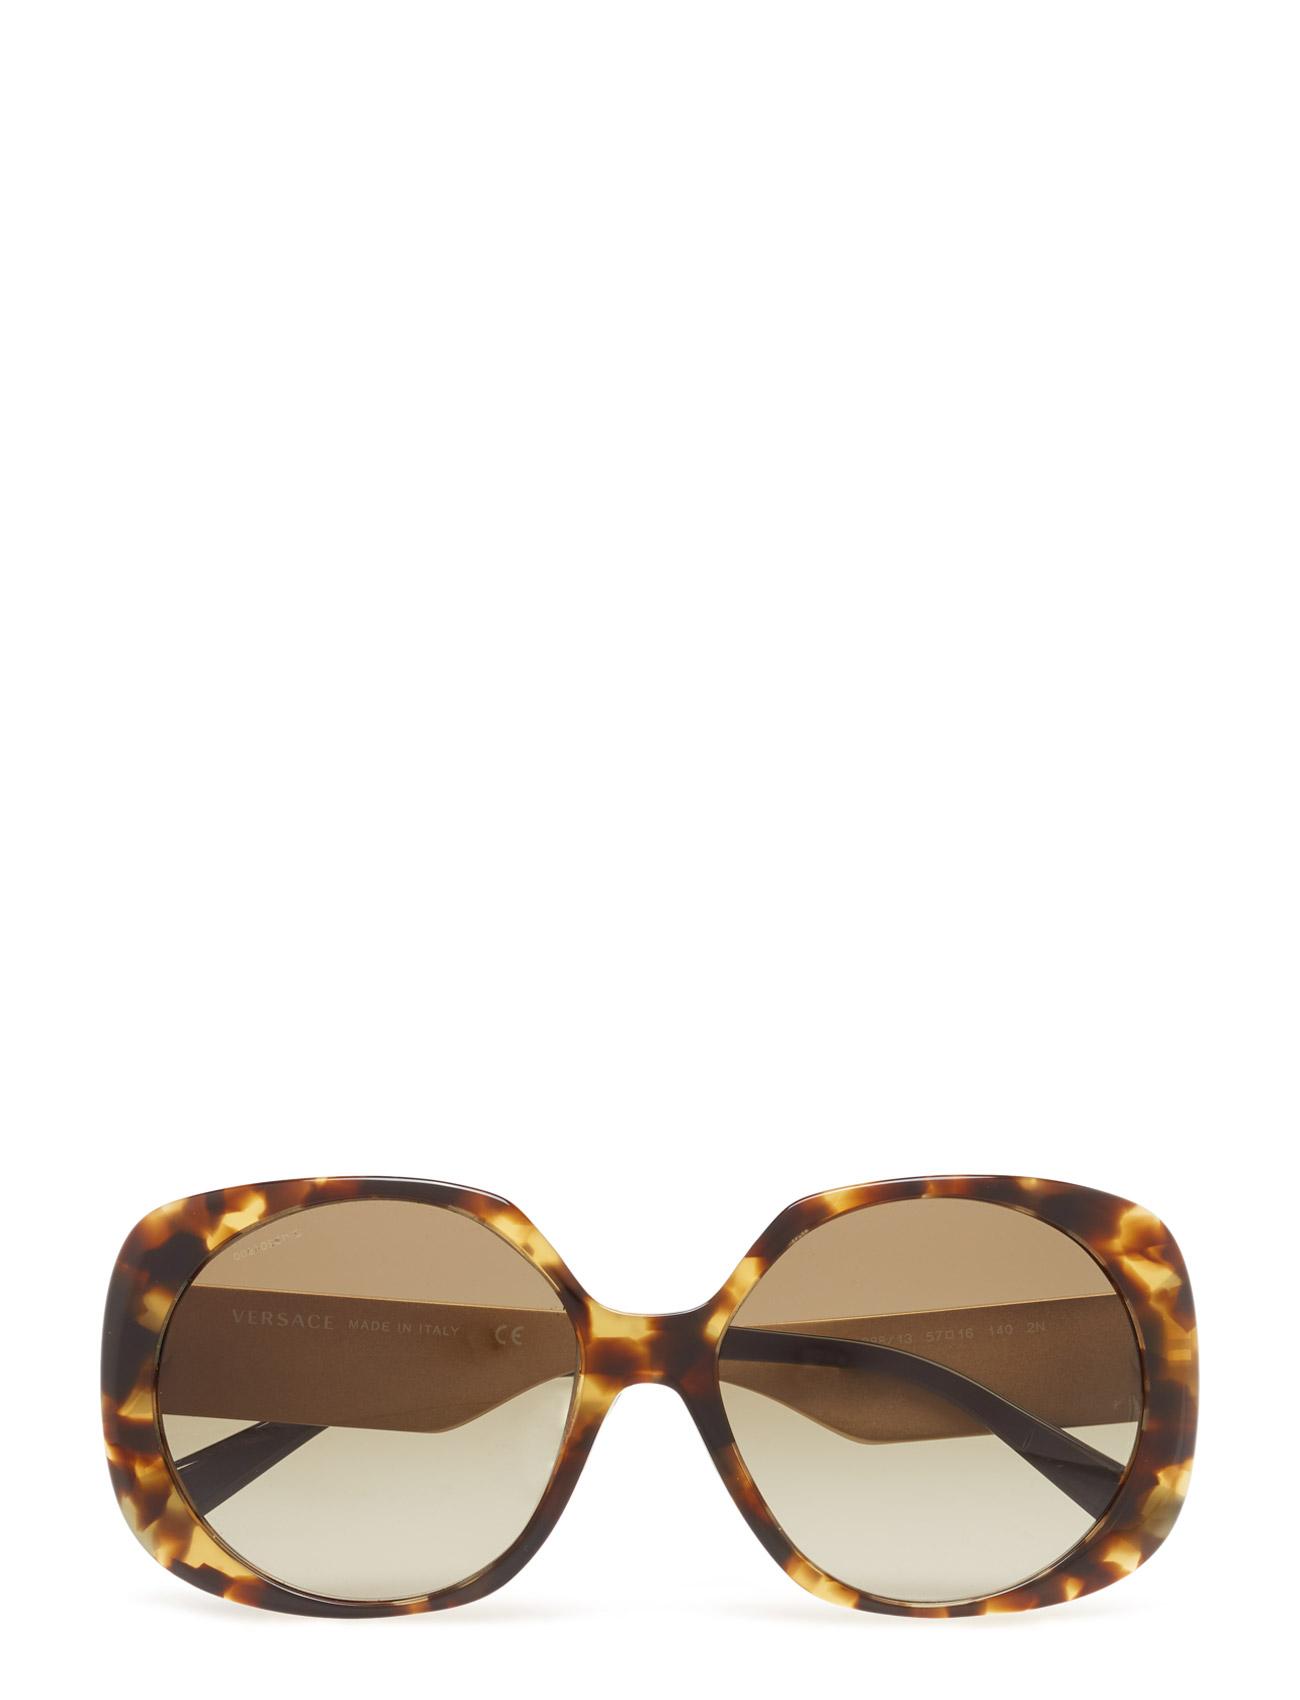 versace sunglasses Rock icons | studs medusa på boozt.com dk